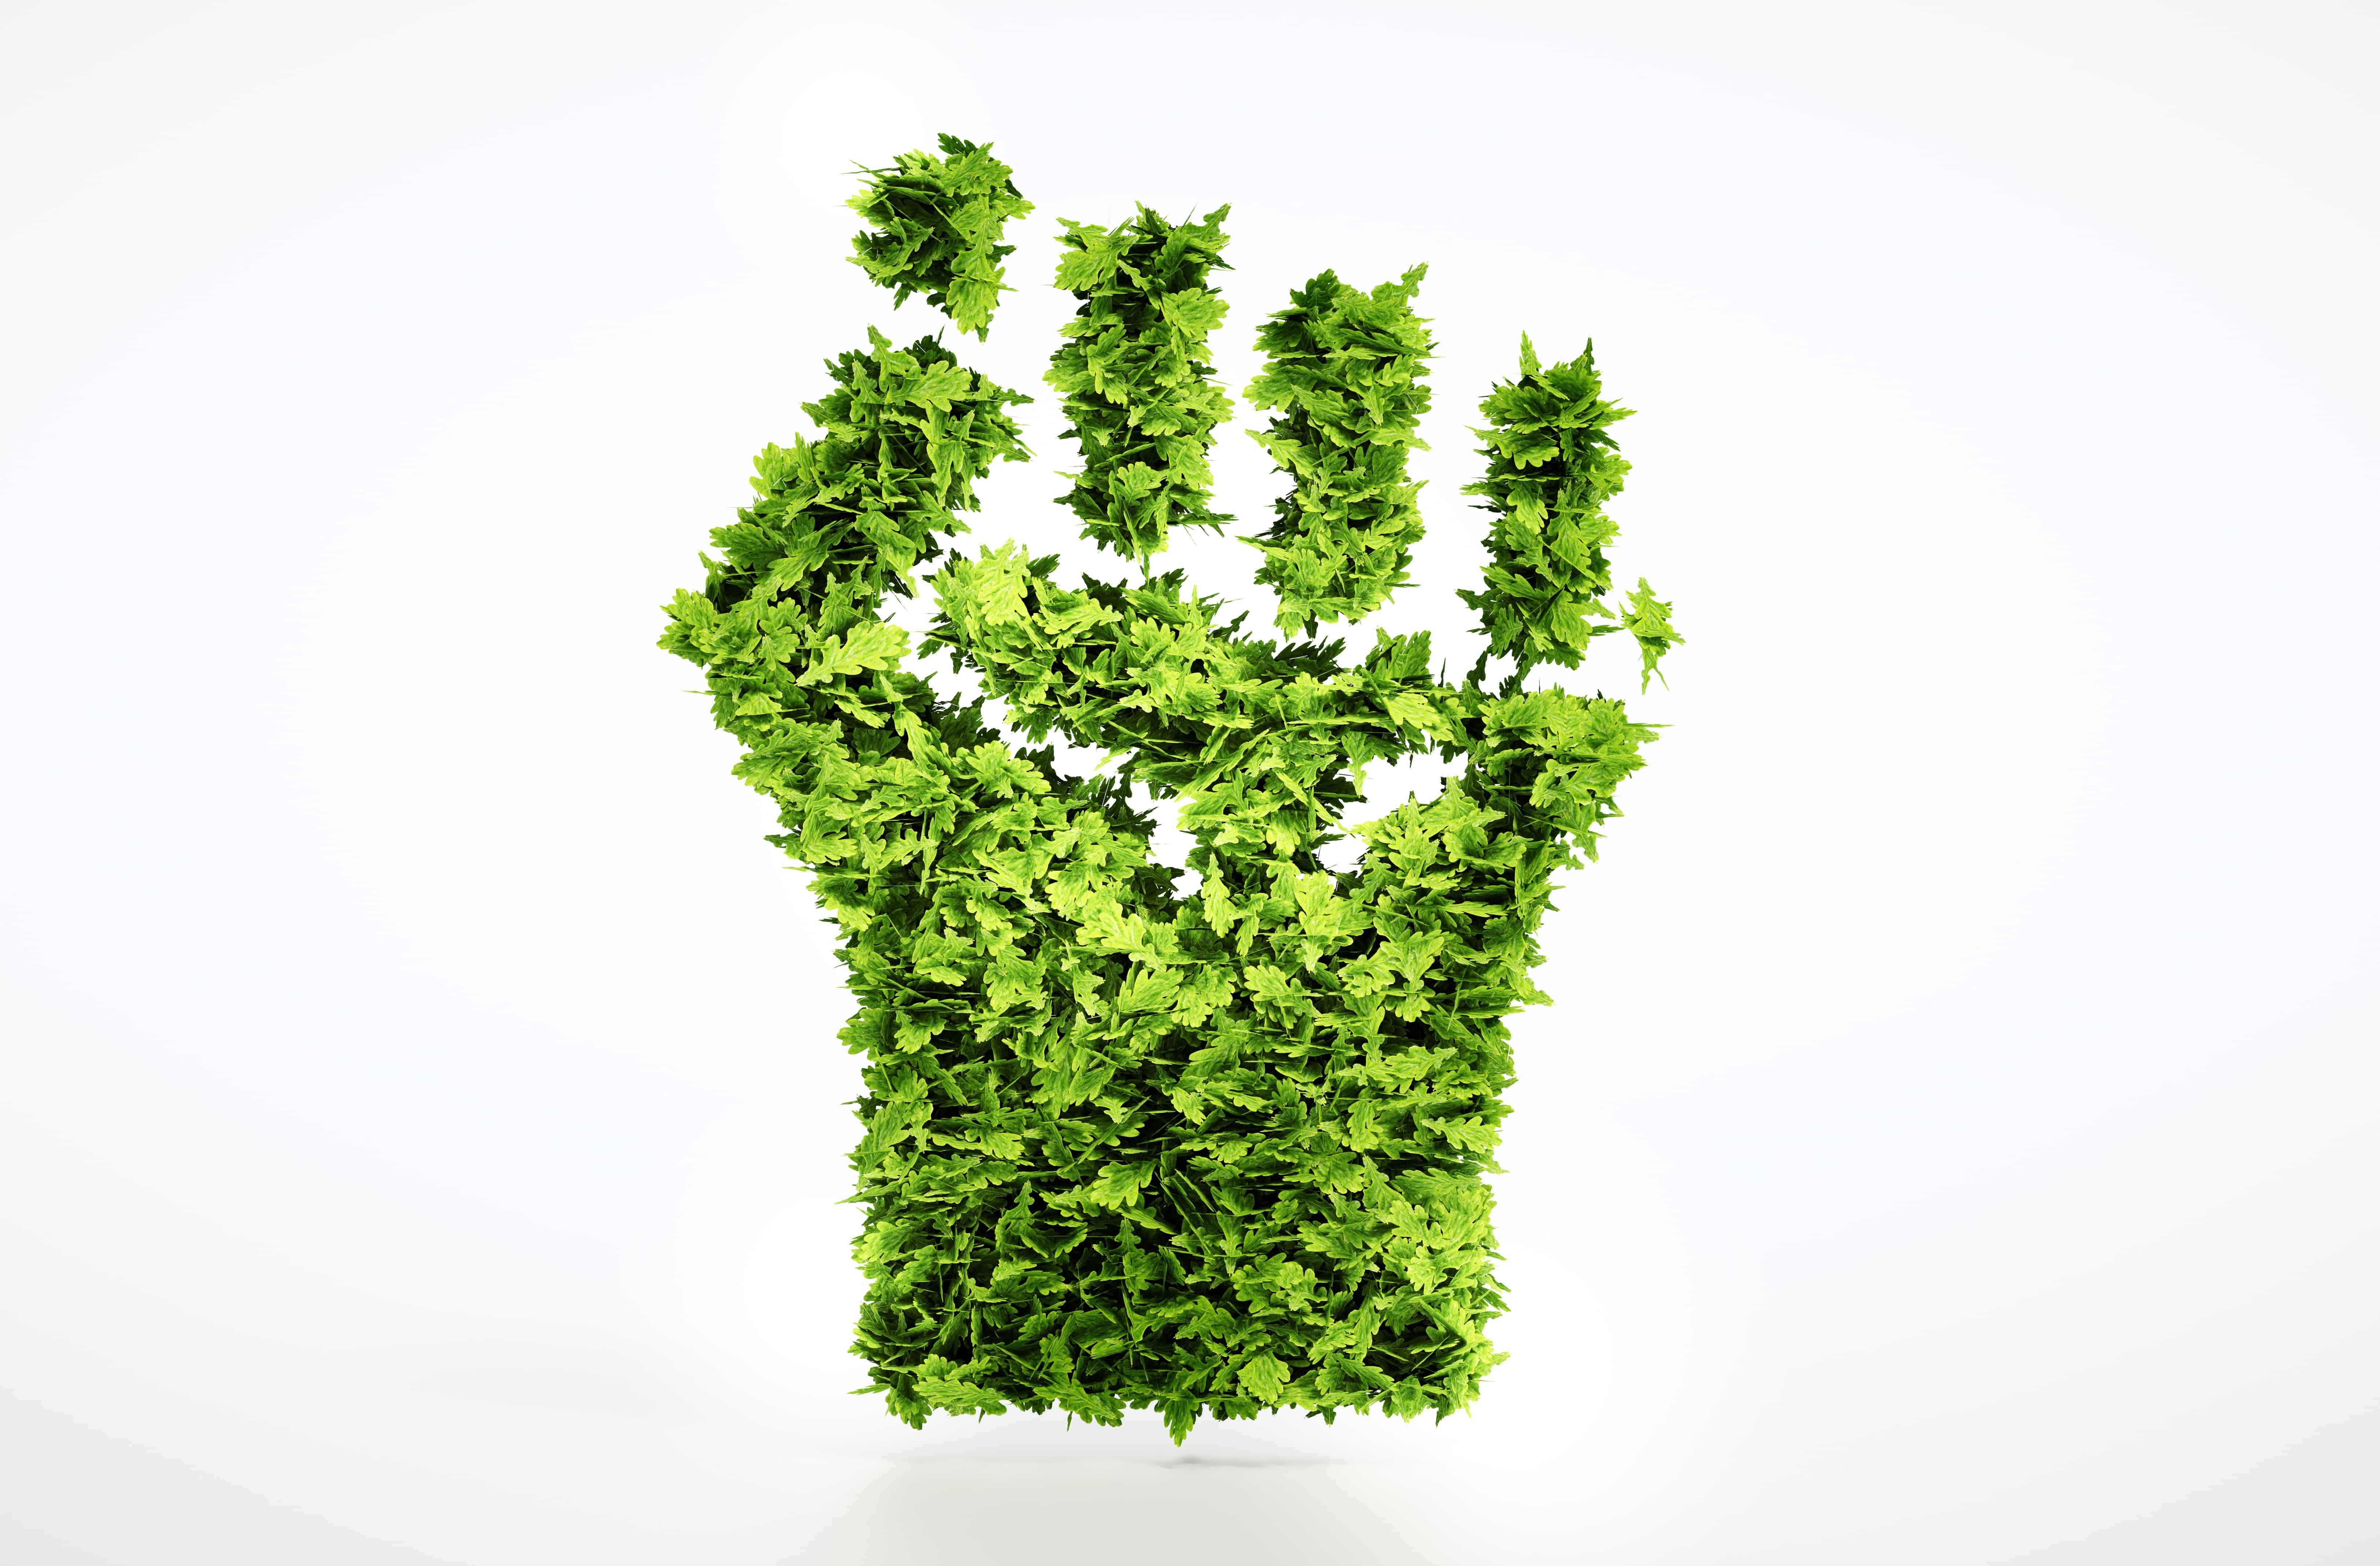 green revolution, technology facts